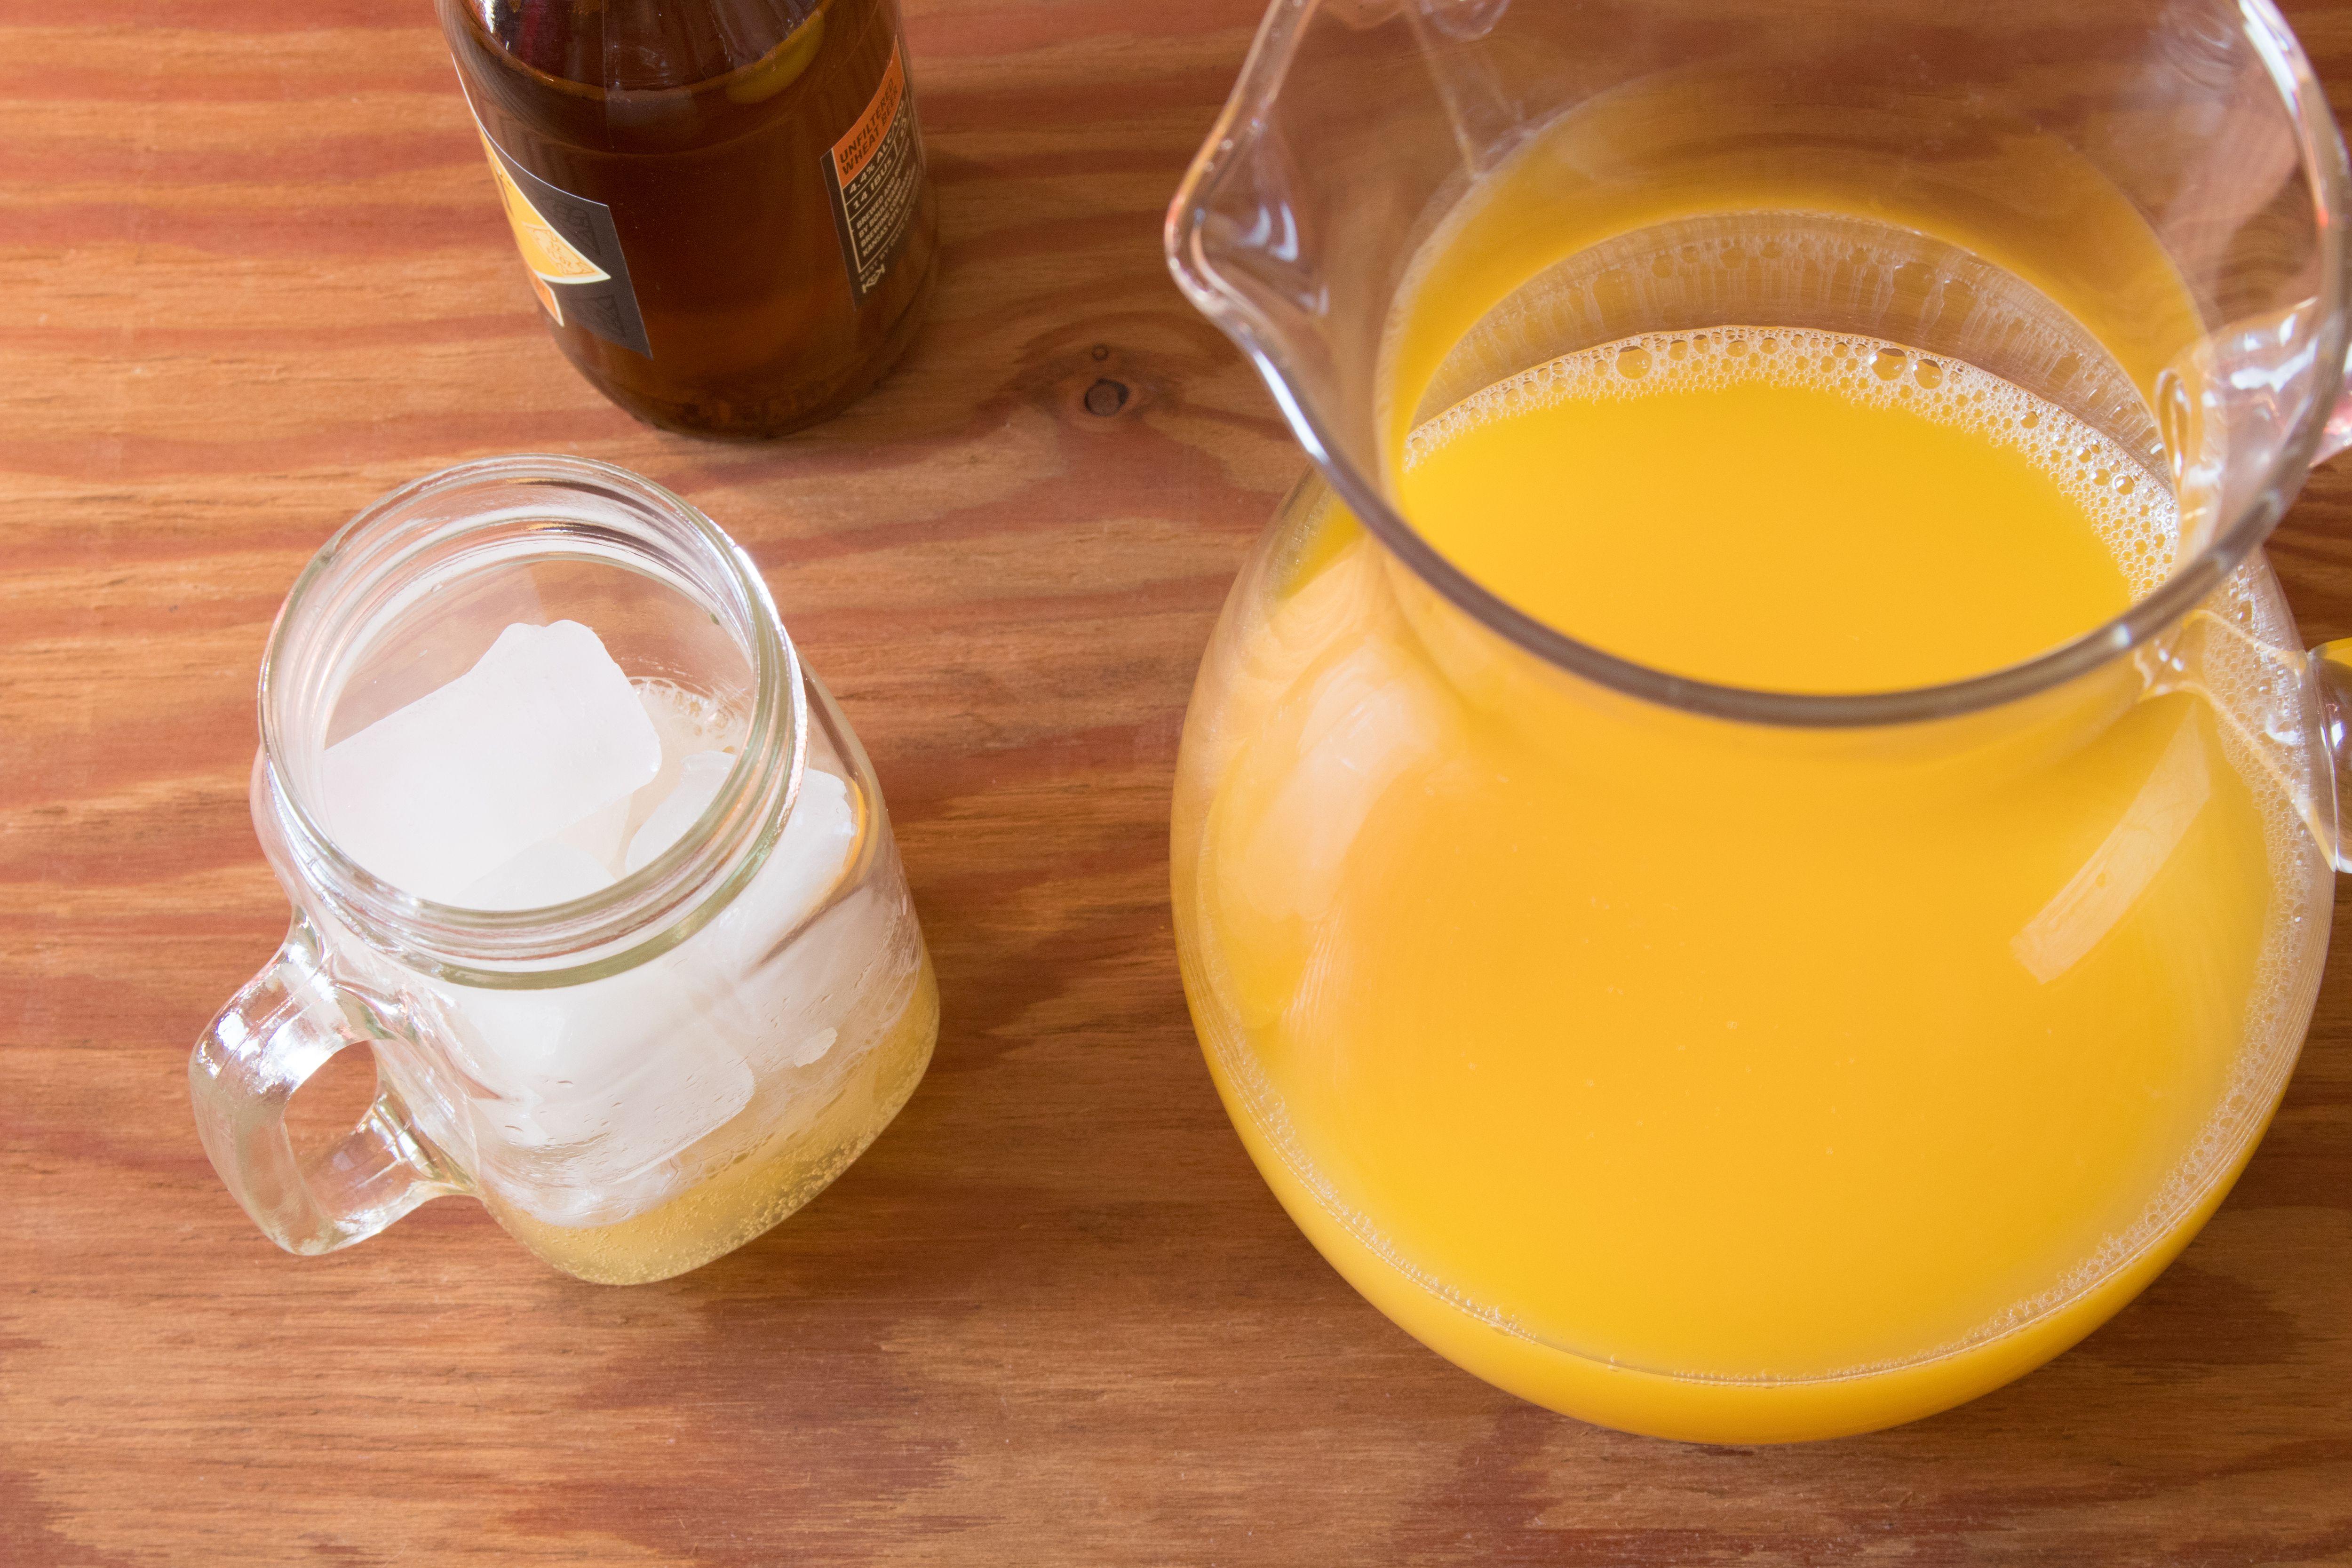 Making a Homemade Orange Shandy